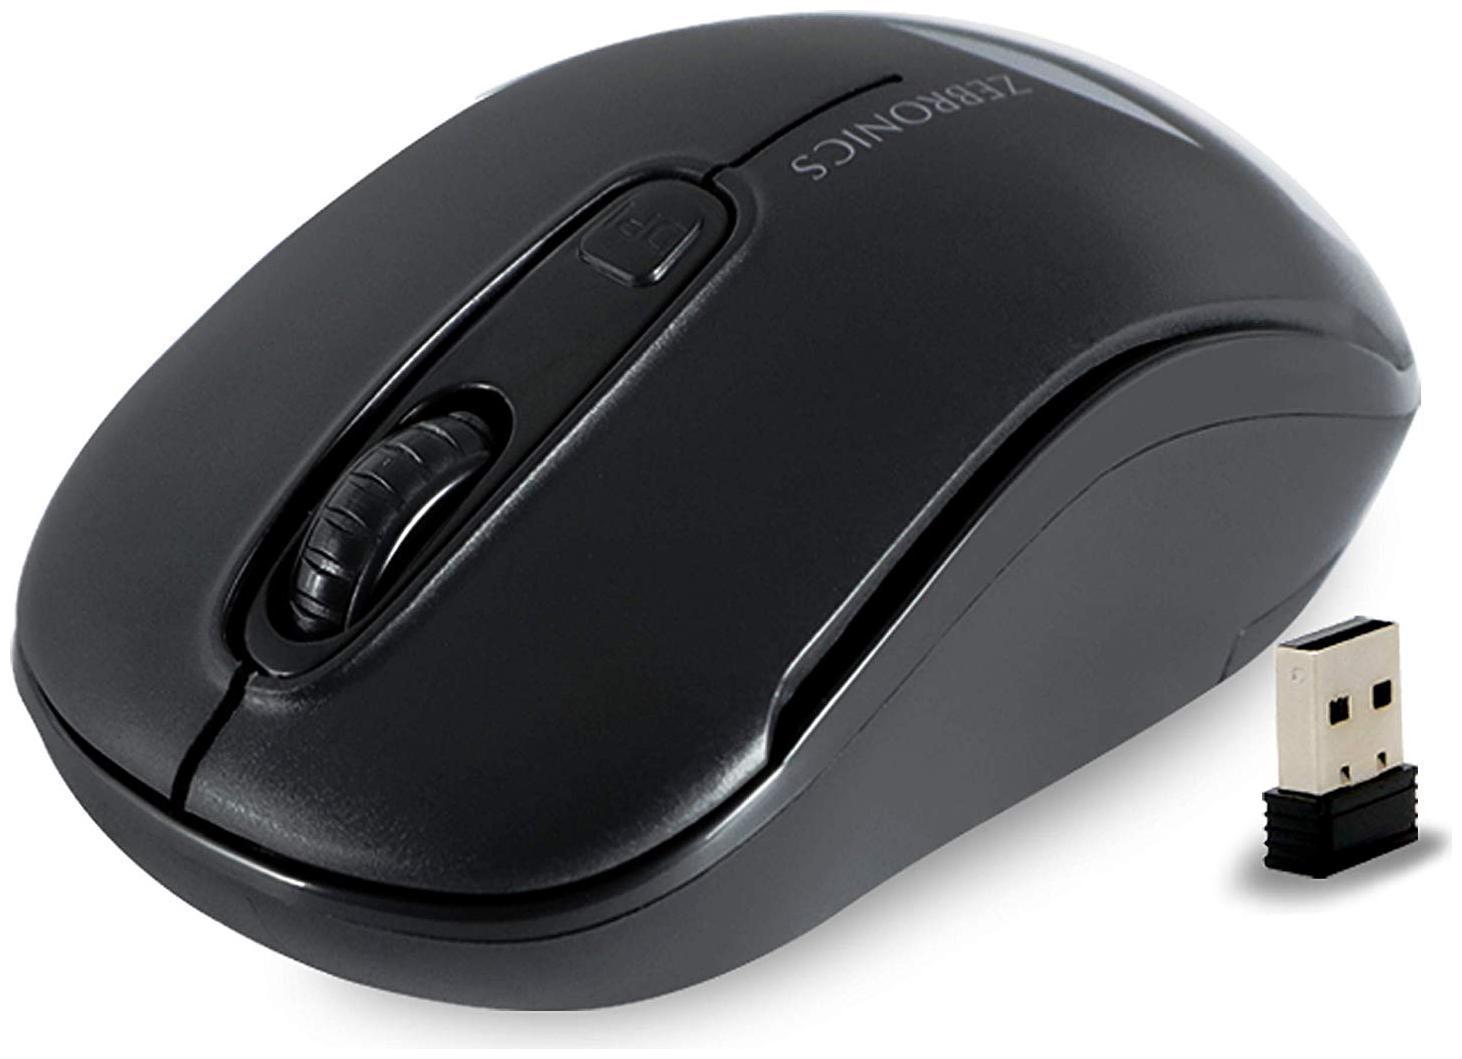 Zebronics Zeb Dash Wireless Mouse   Black